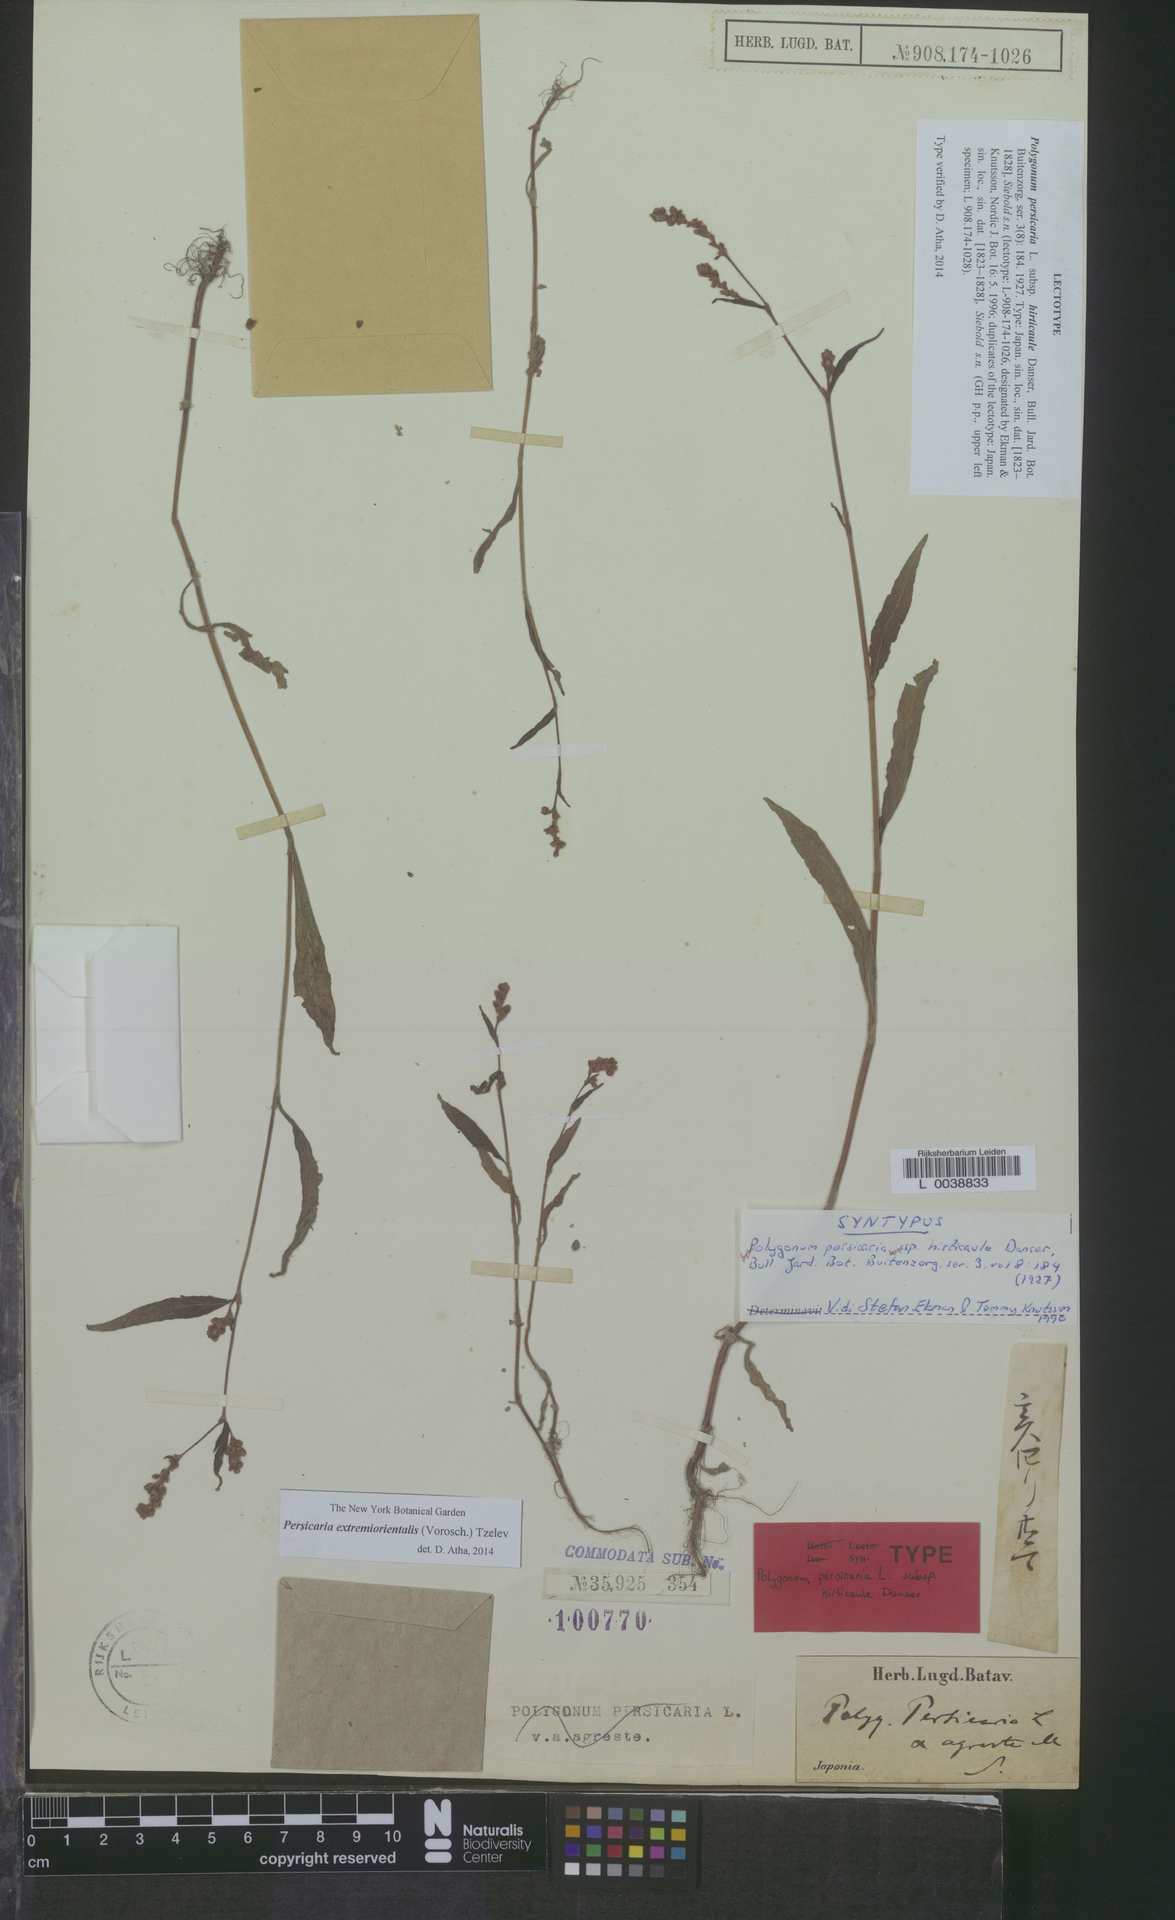 L  0038833 | Persicaria extremiorientalis (Vorosch.) Tzelev